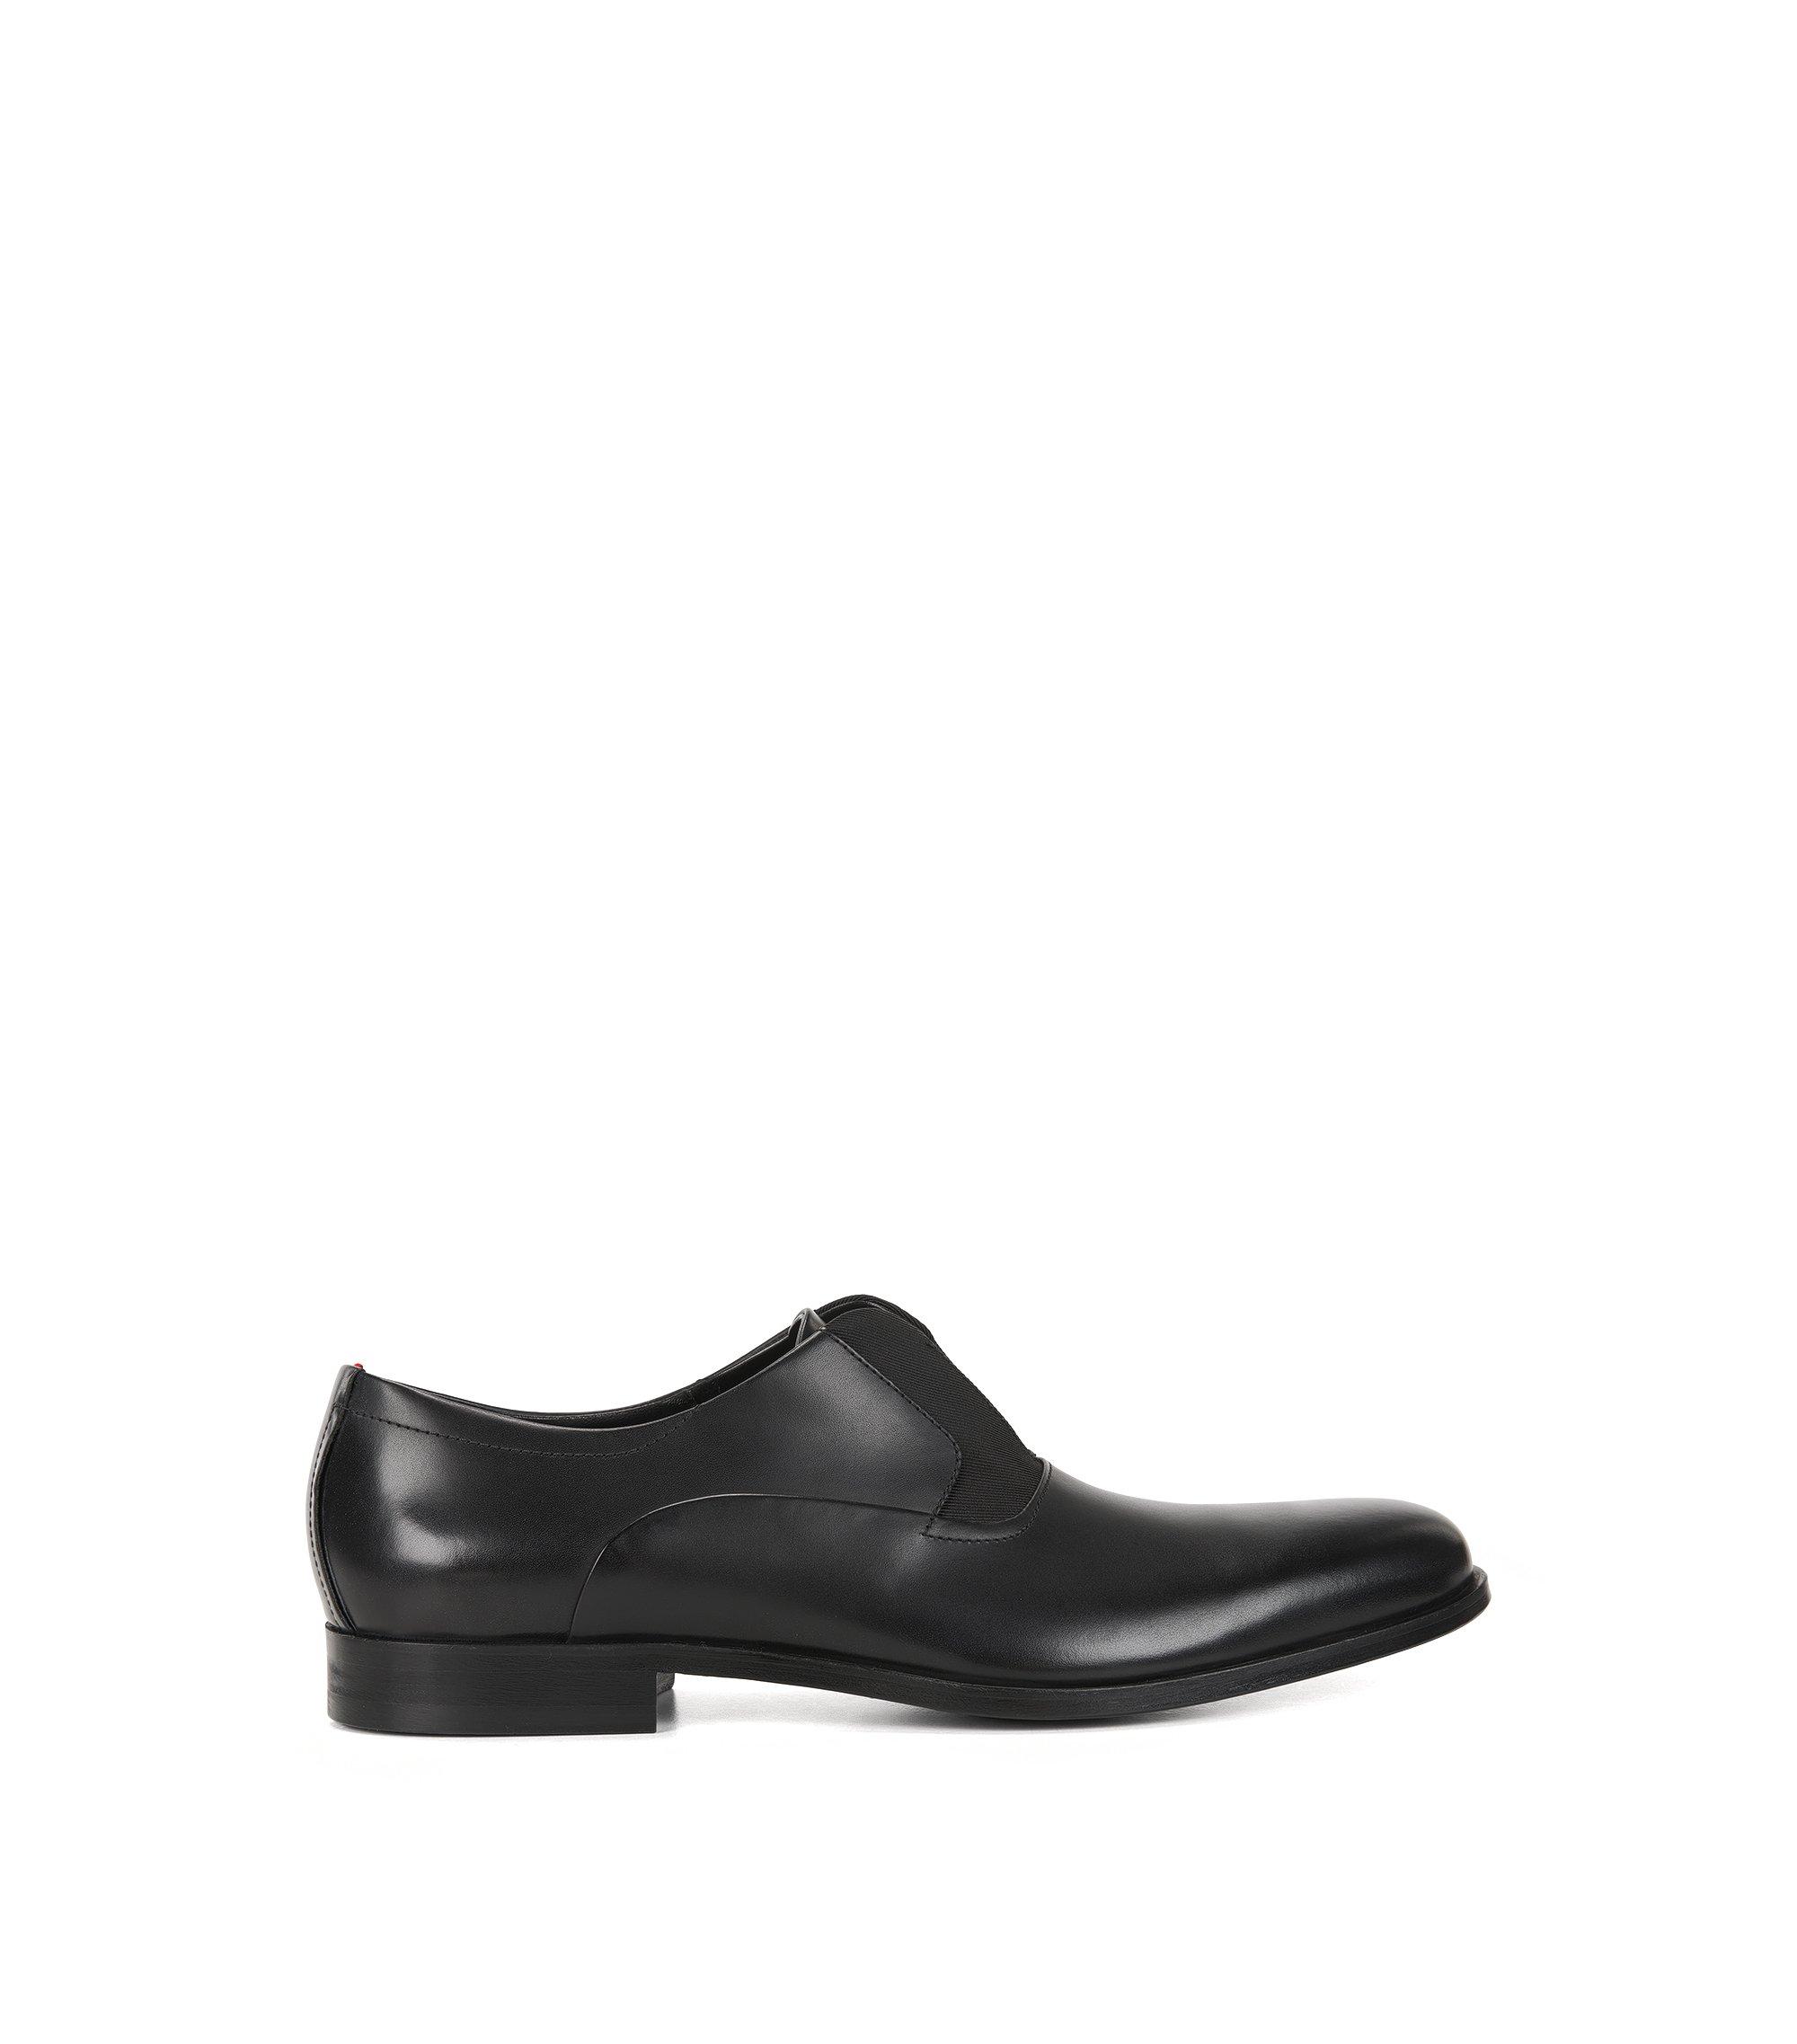 Chaussures Oxford à enfiler en cuir, Noir